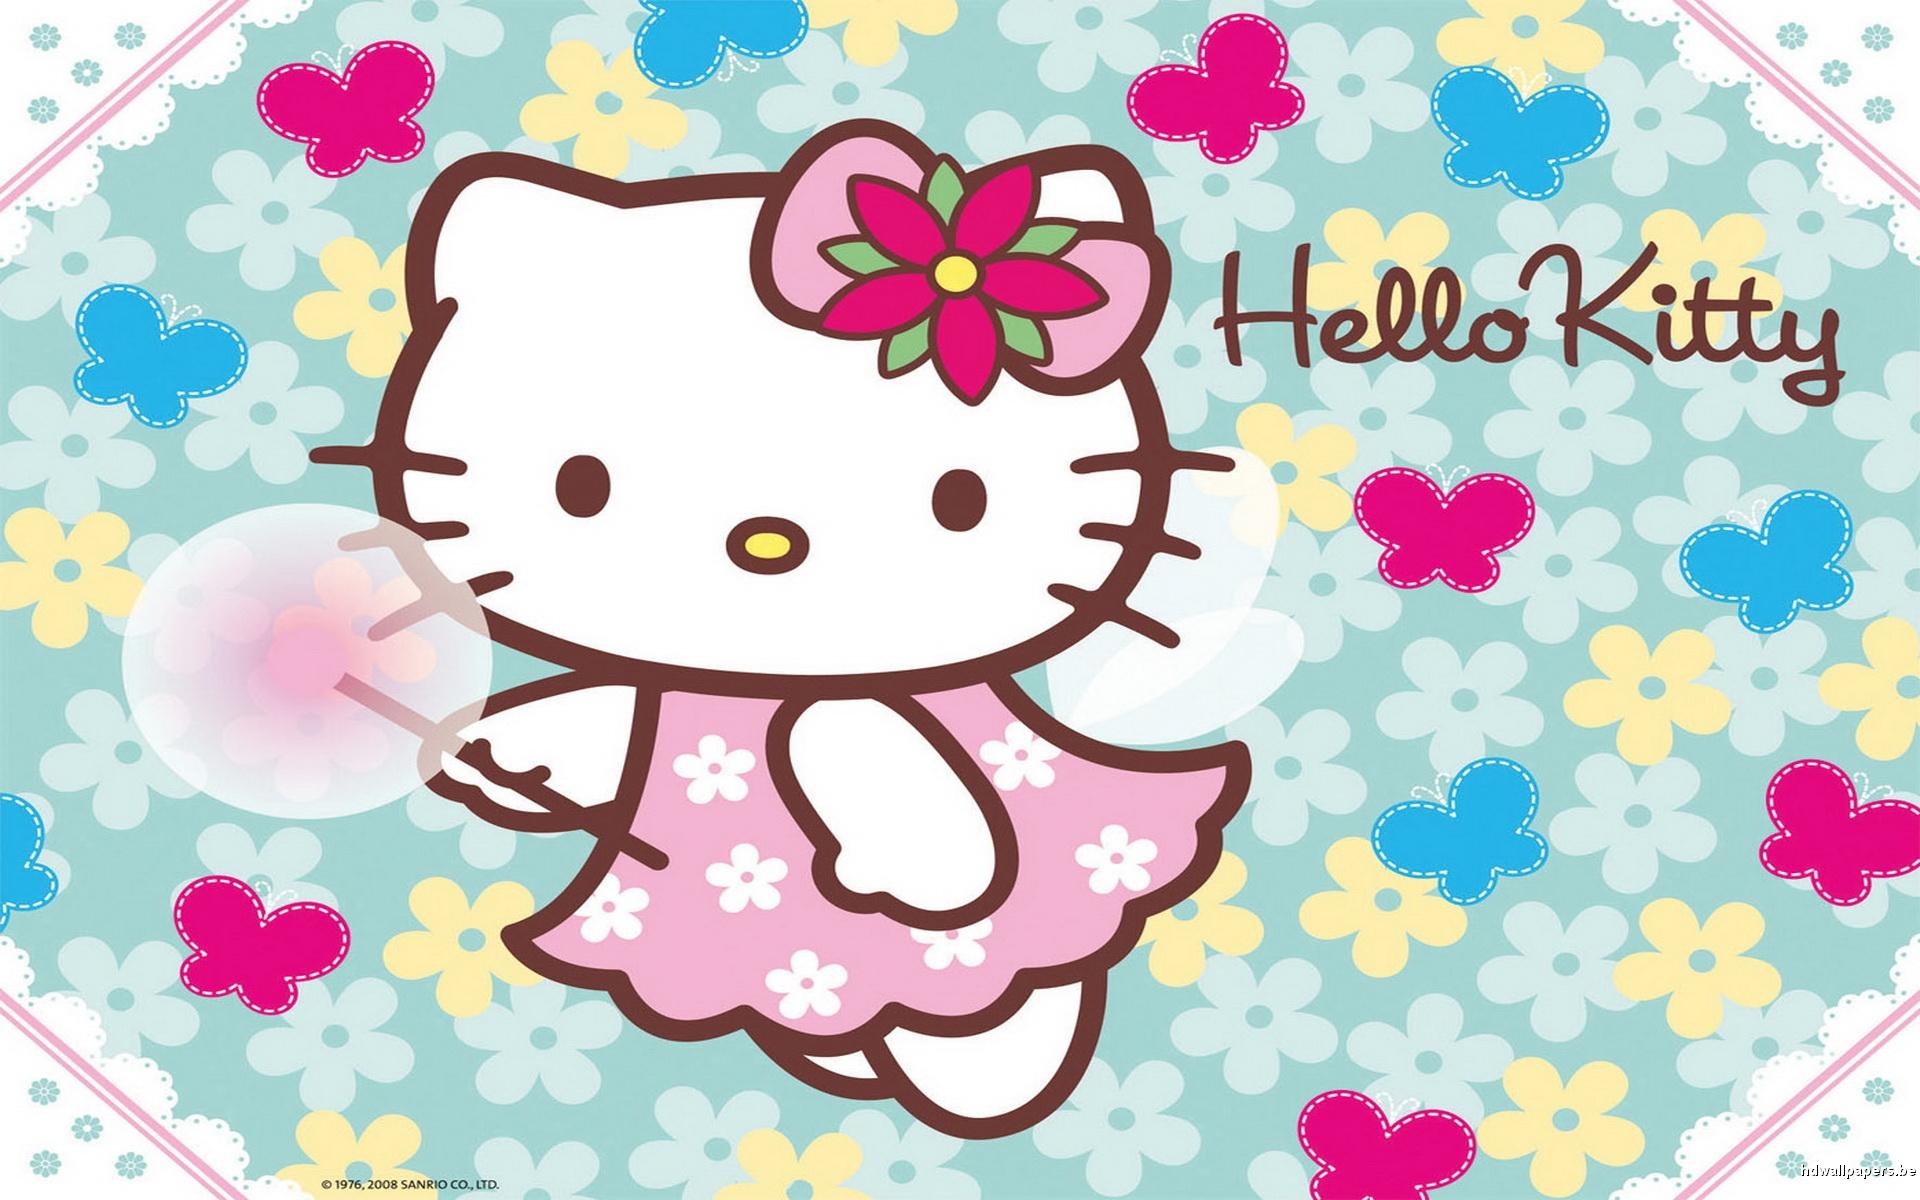 Hello Kitty Wallpaper 2, Hello Kitty Wallpapers, Widescreen, Desktop ...